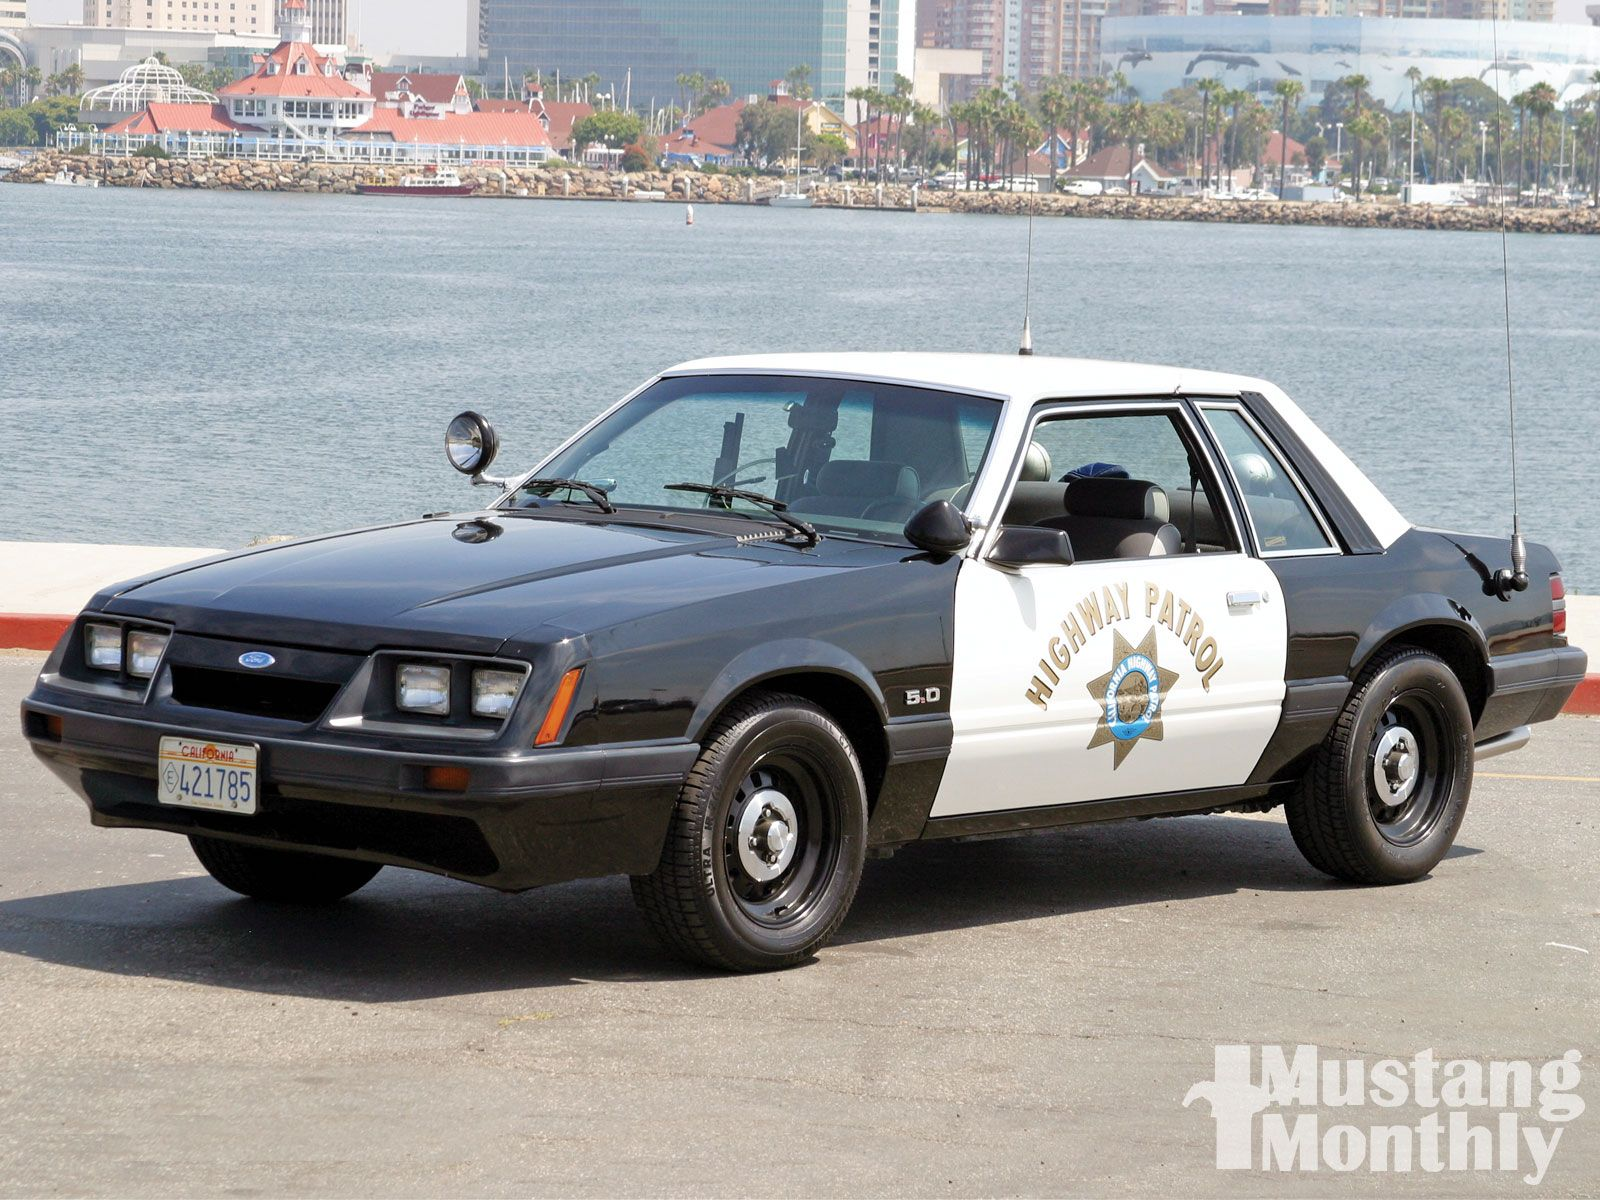 ◆CHP Fox Body Ford Mustang SSP Police Car◆